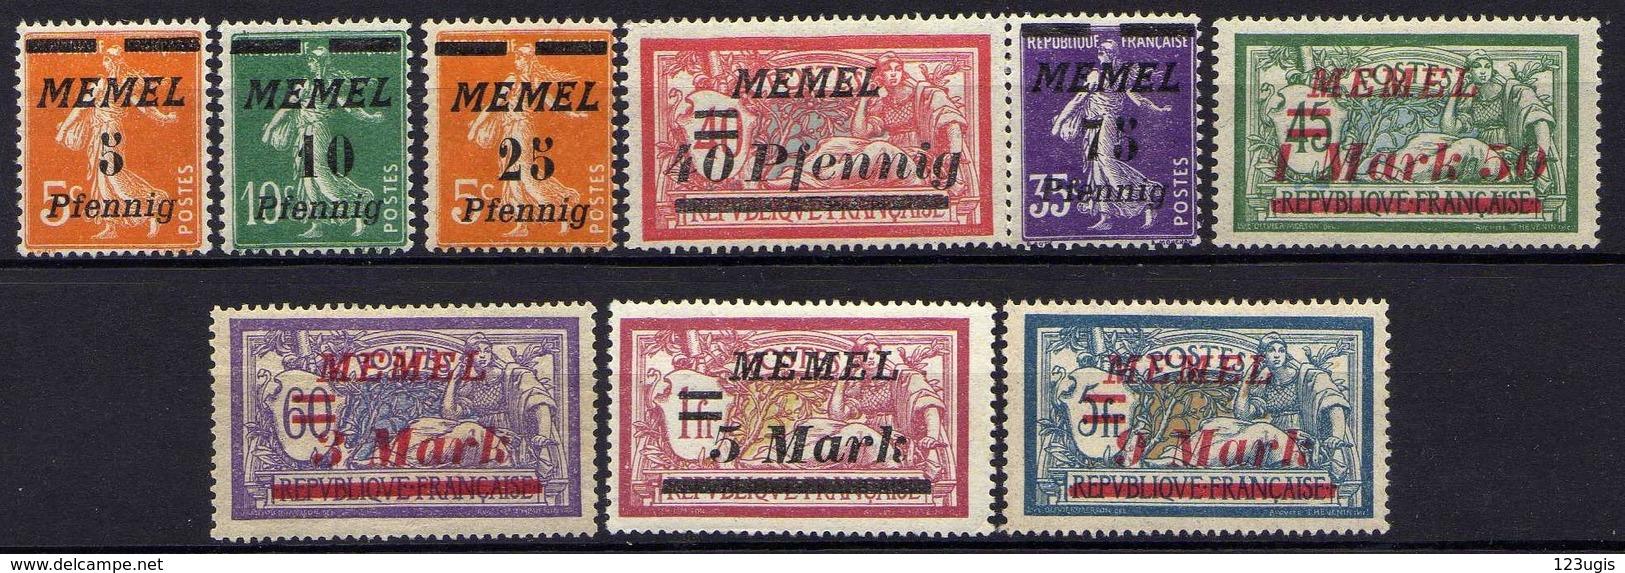 Memel (Klaipeda) 1922 Mi 52-53; 58; 60; 62; 66; 68-69; 71 * [120119XXII] - Memelgebiet